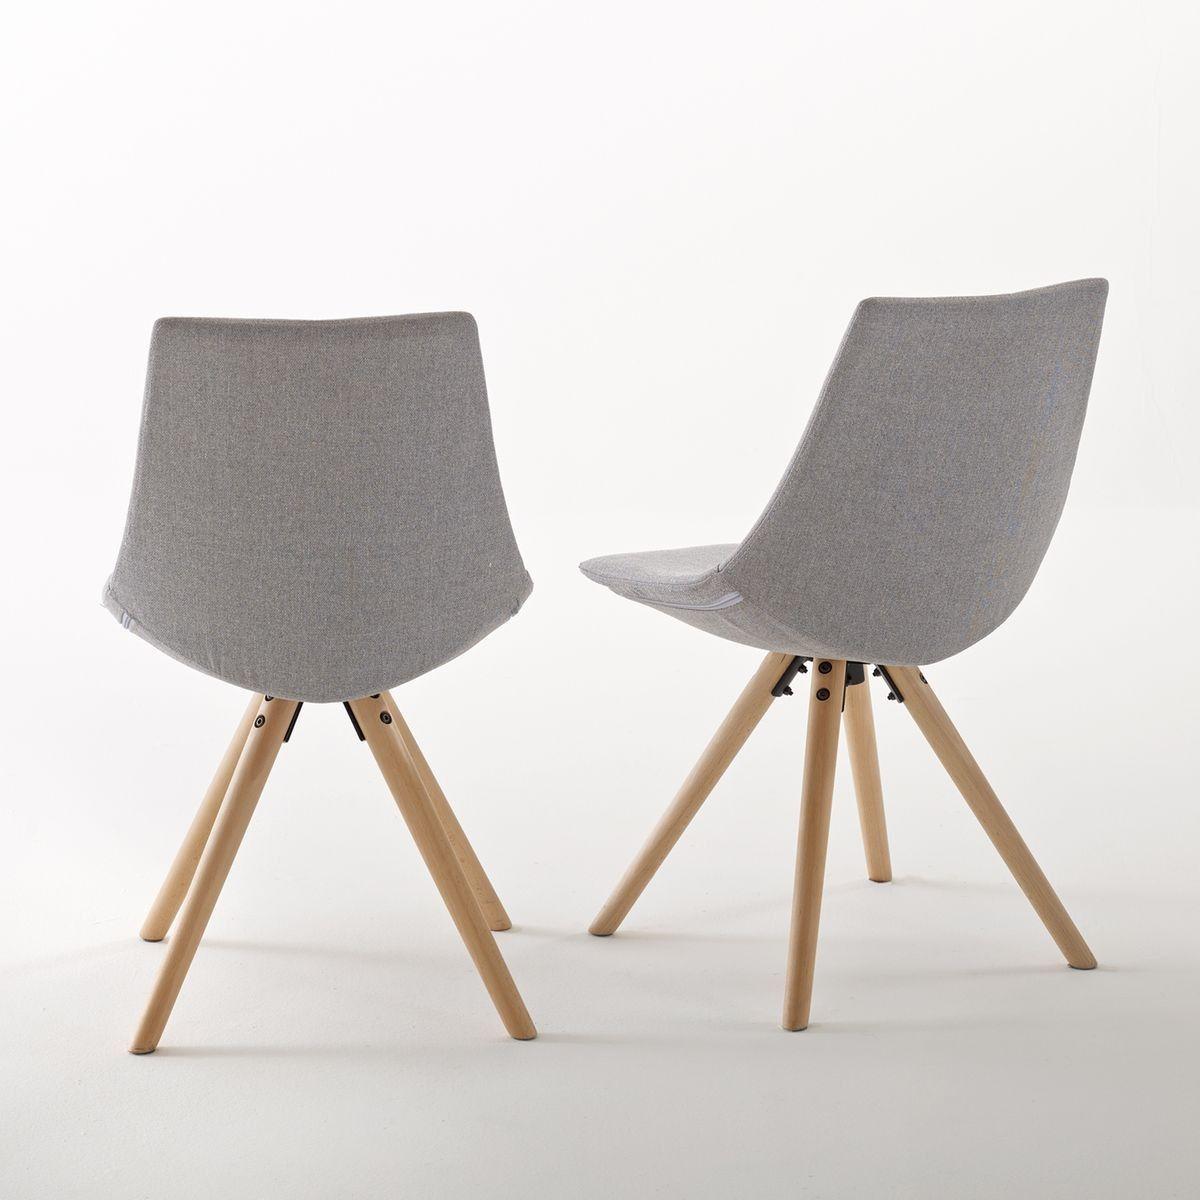 Lot De 2 Chaises Rembourrees Asting Taille Taille Unique Chaises Rembourrees Table Et Chaises Et Chaise